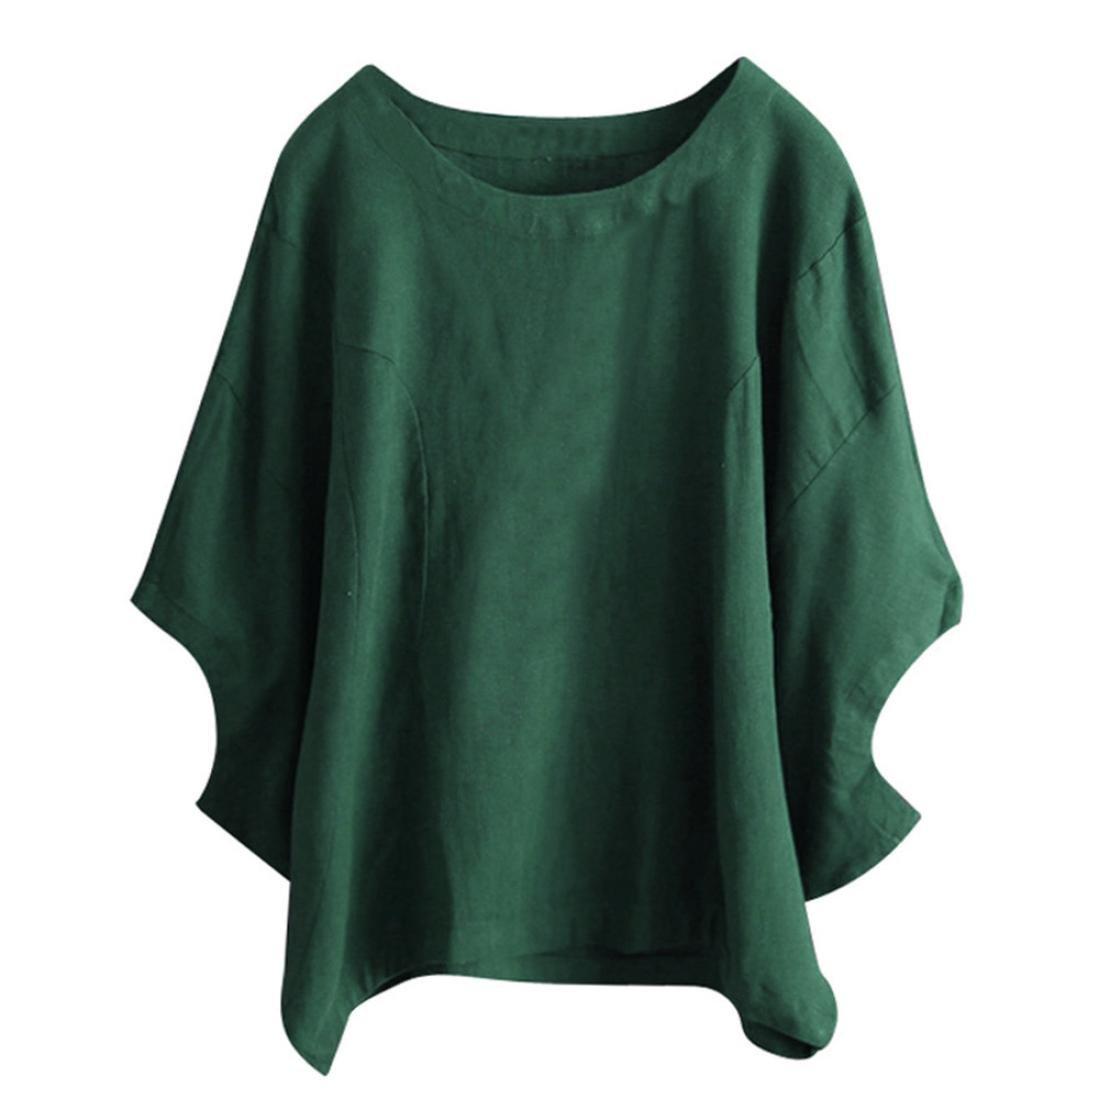 EnjoCho Women's Spring Summer Solid Print Short Sleeve Irregular Hem Asymmetrical Tunic Loose Long Blouse Tops (Size:XL, Green)